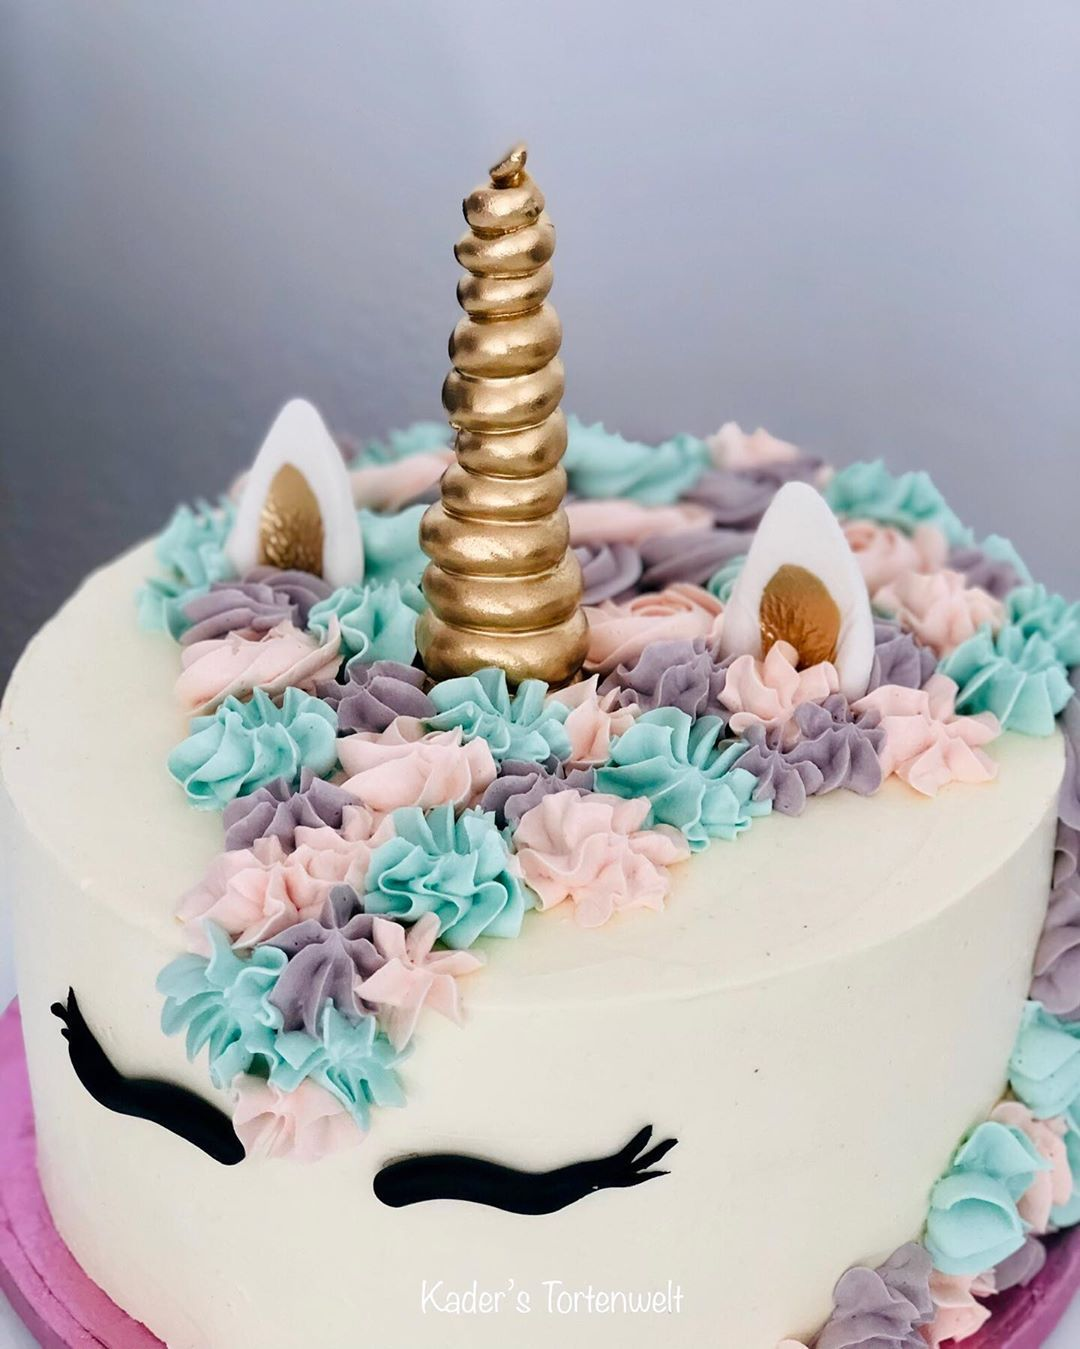 Unicorn 🦄 . . #unicorn#unicorncake#cake#birthday#birthdaycake#torte#geburtstag#einhorn#swissmeringue#buttercream#bakery#bakerylove#instagram#instacake#